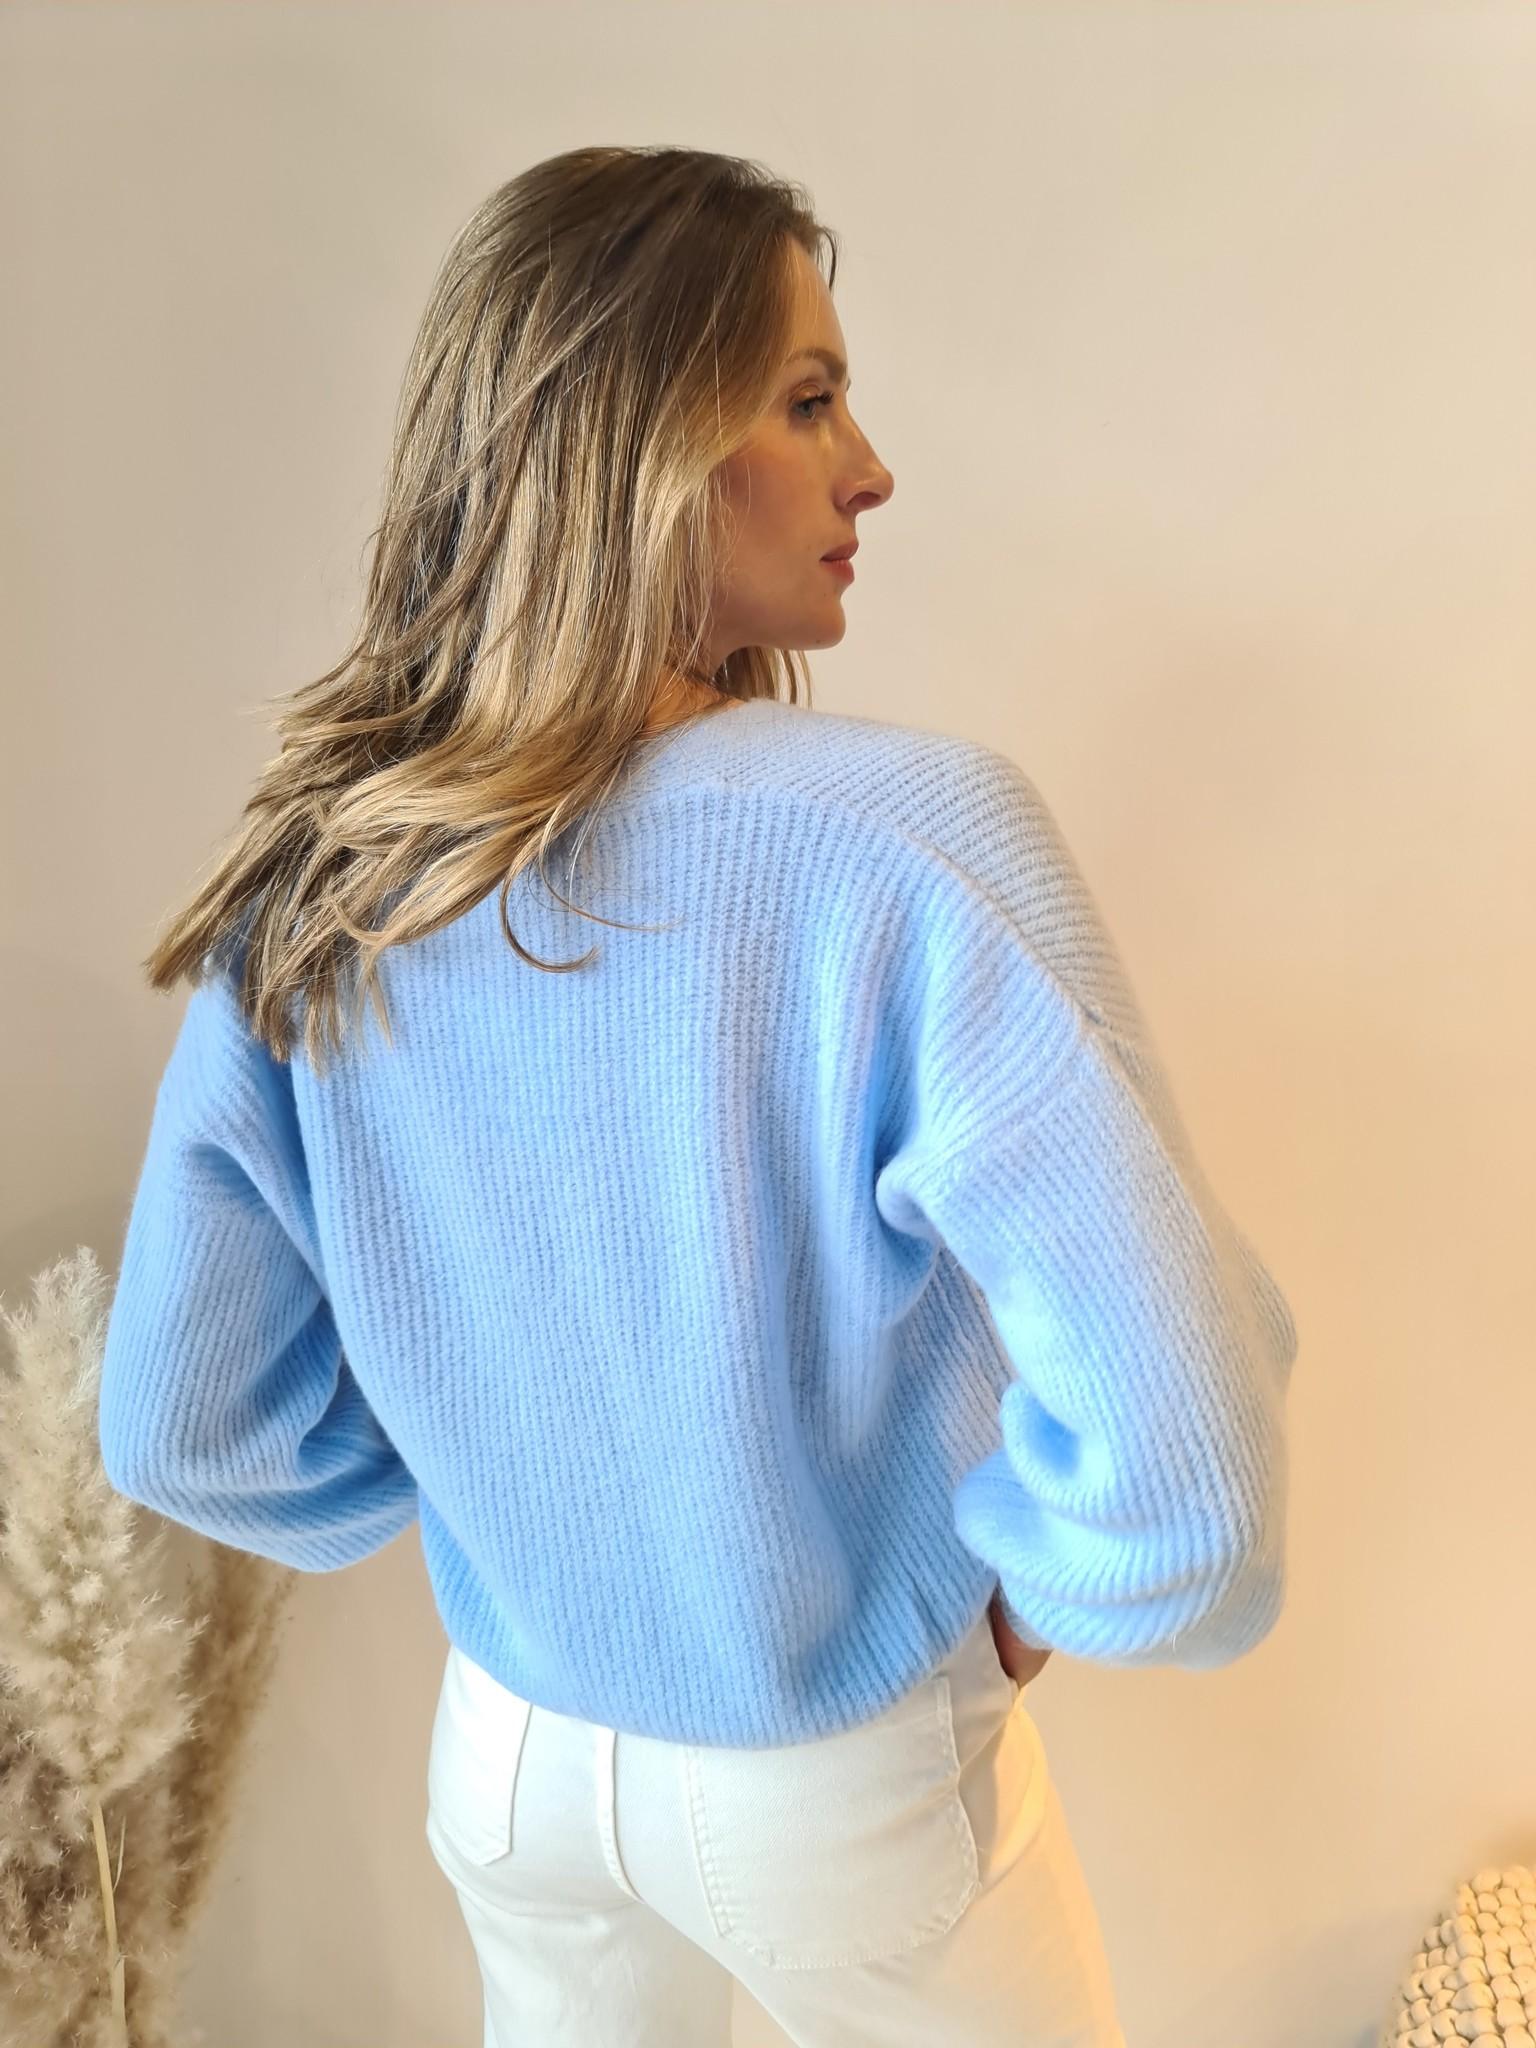 TRENDY gilet bleu ciel-4